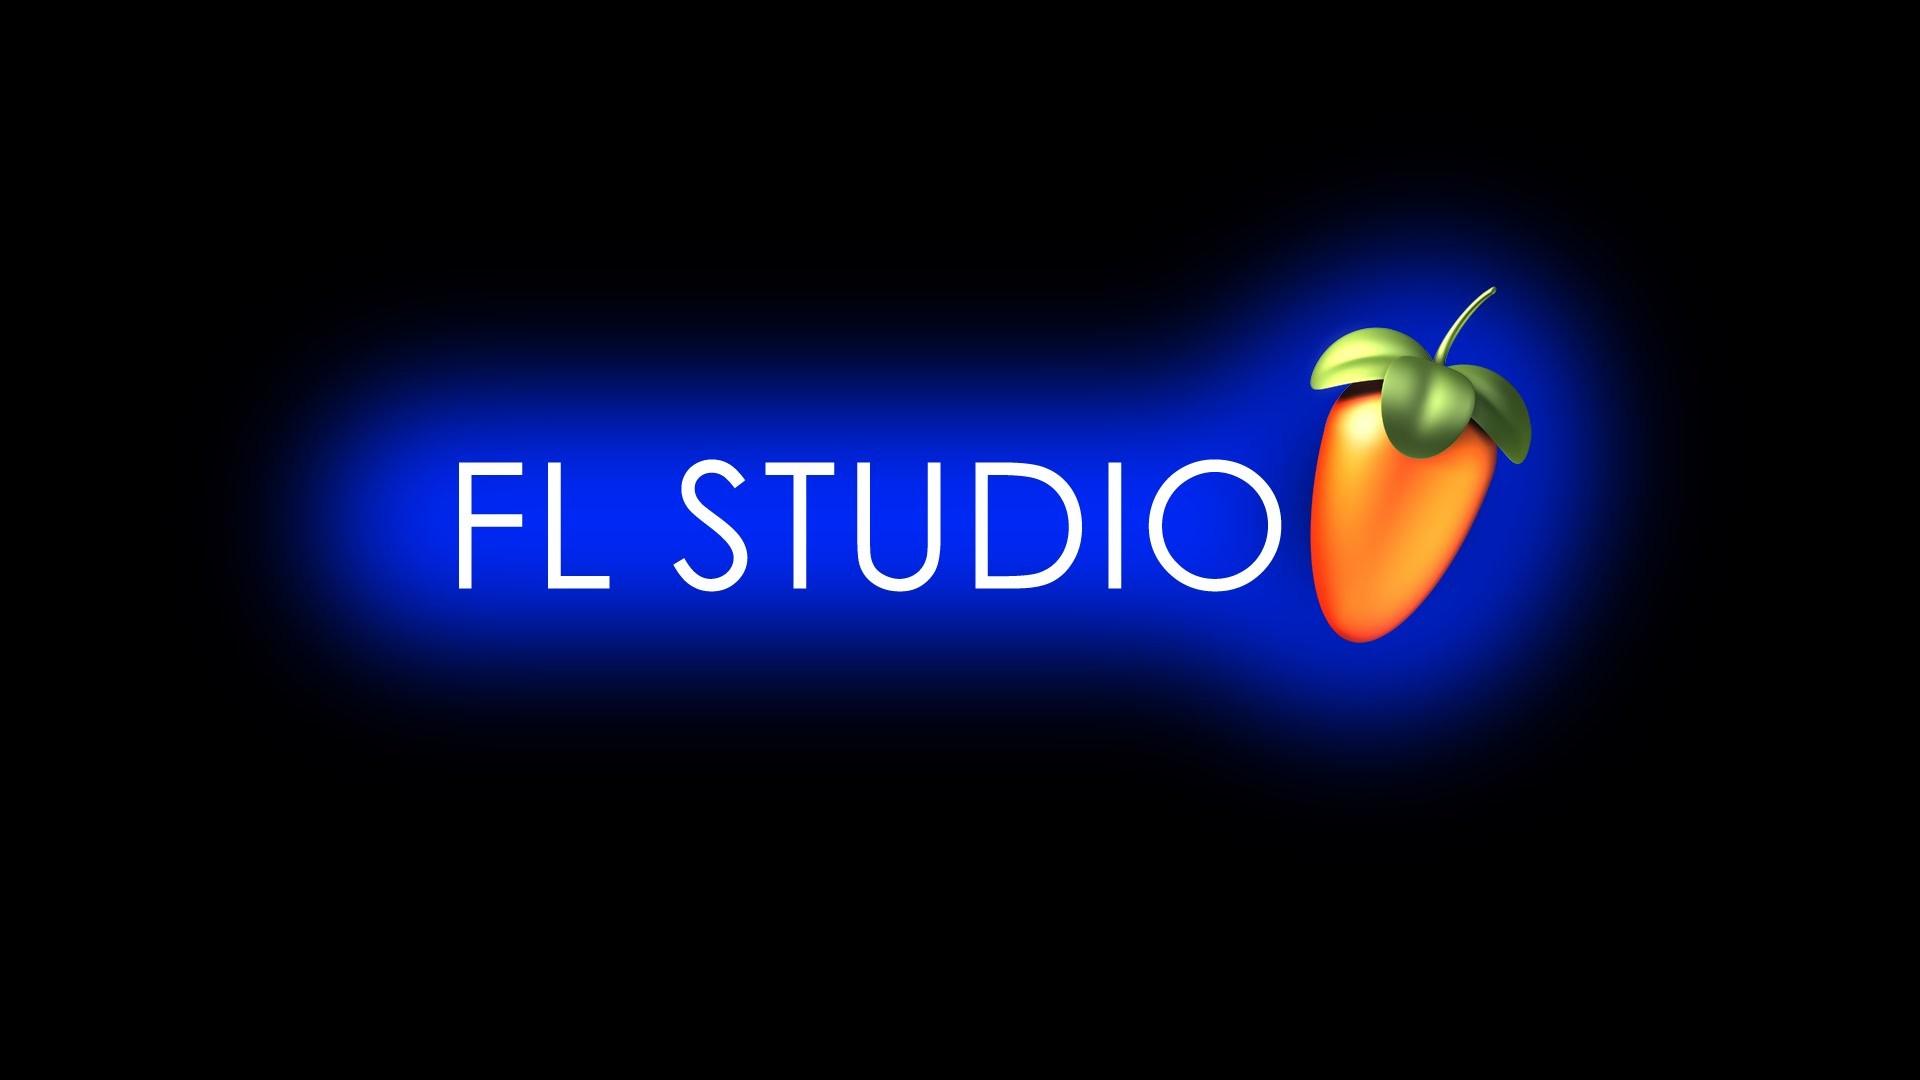 Projet fl studio rai 2017